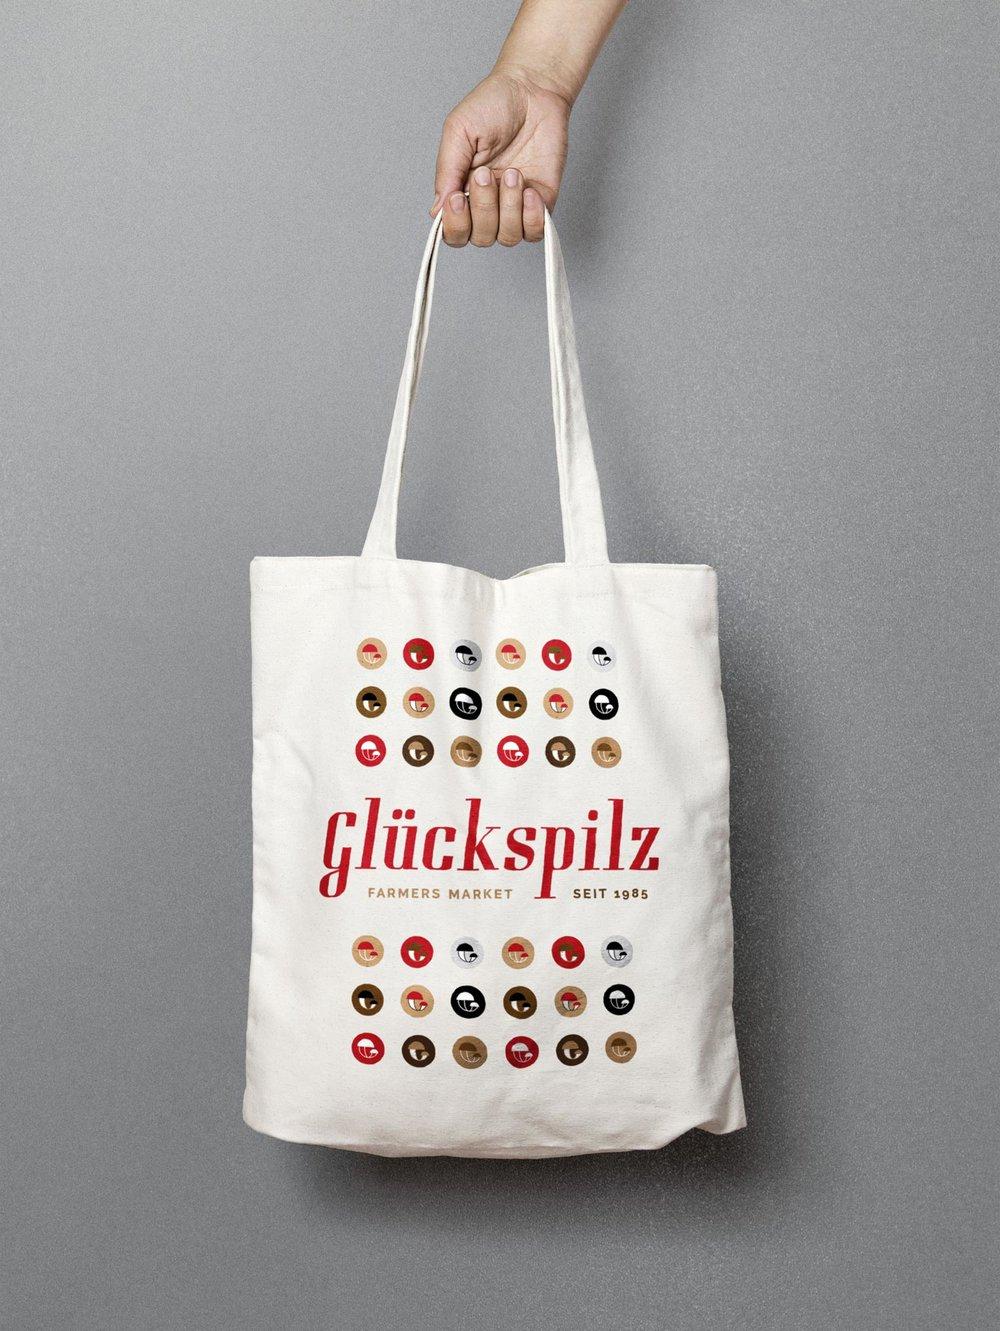 glueckspilz-canvas_totebag-mockup1.jpg